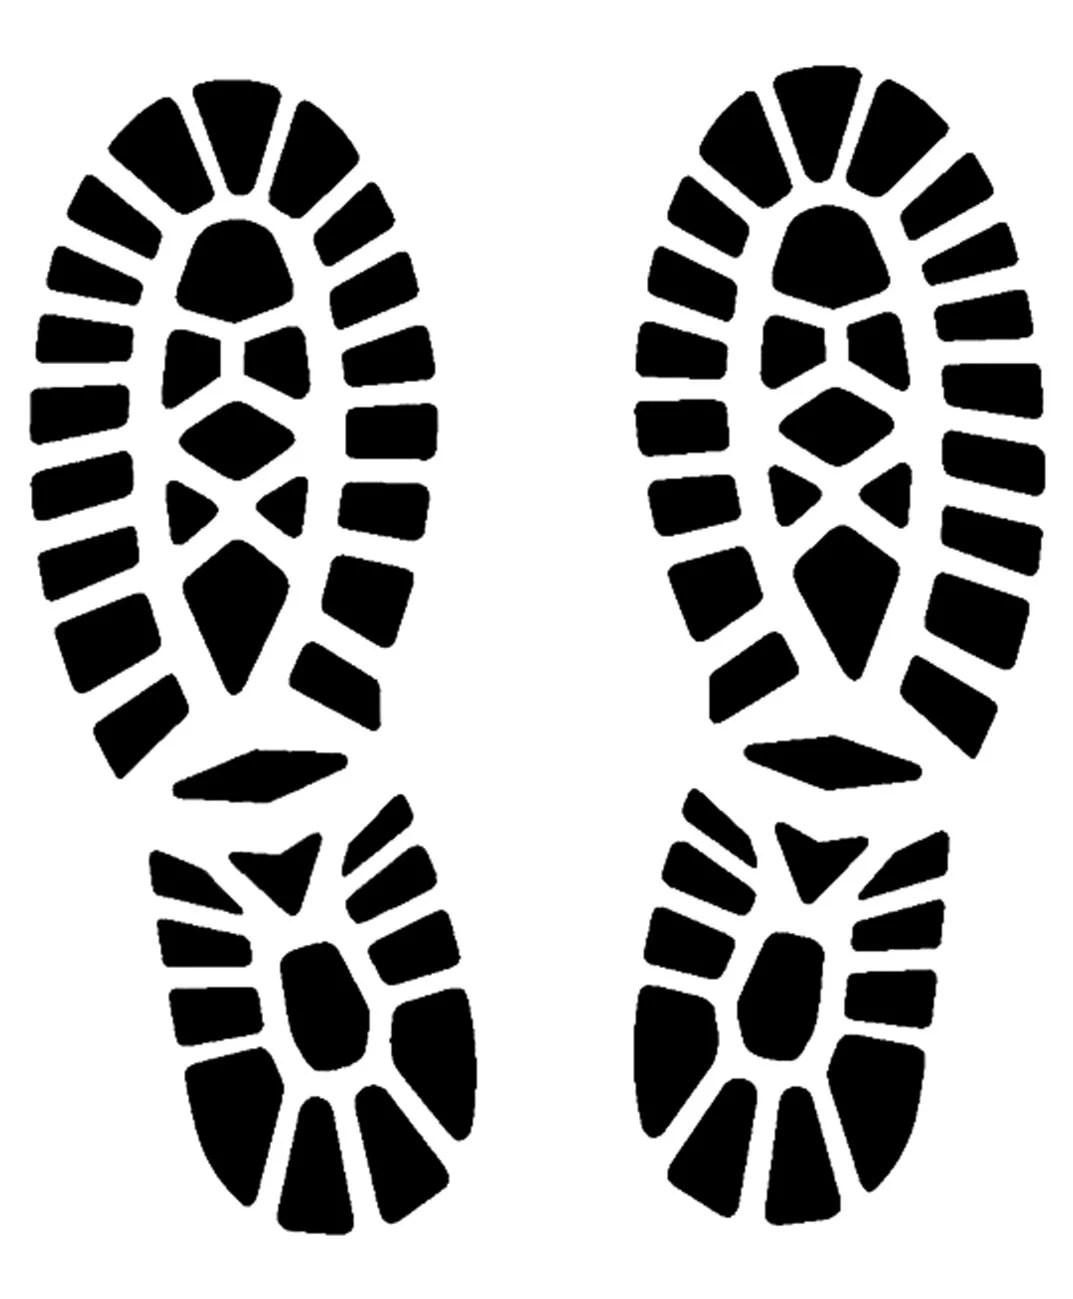 Footprints stencil art shoes 5 stencils sizes svg dwg dxf